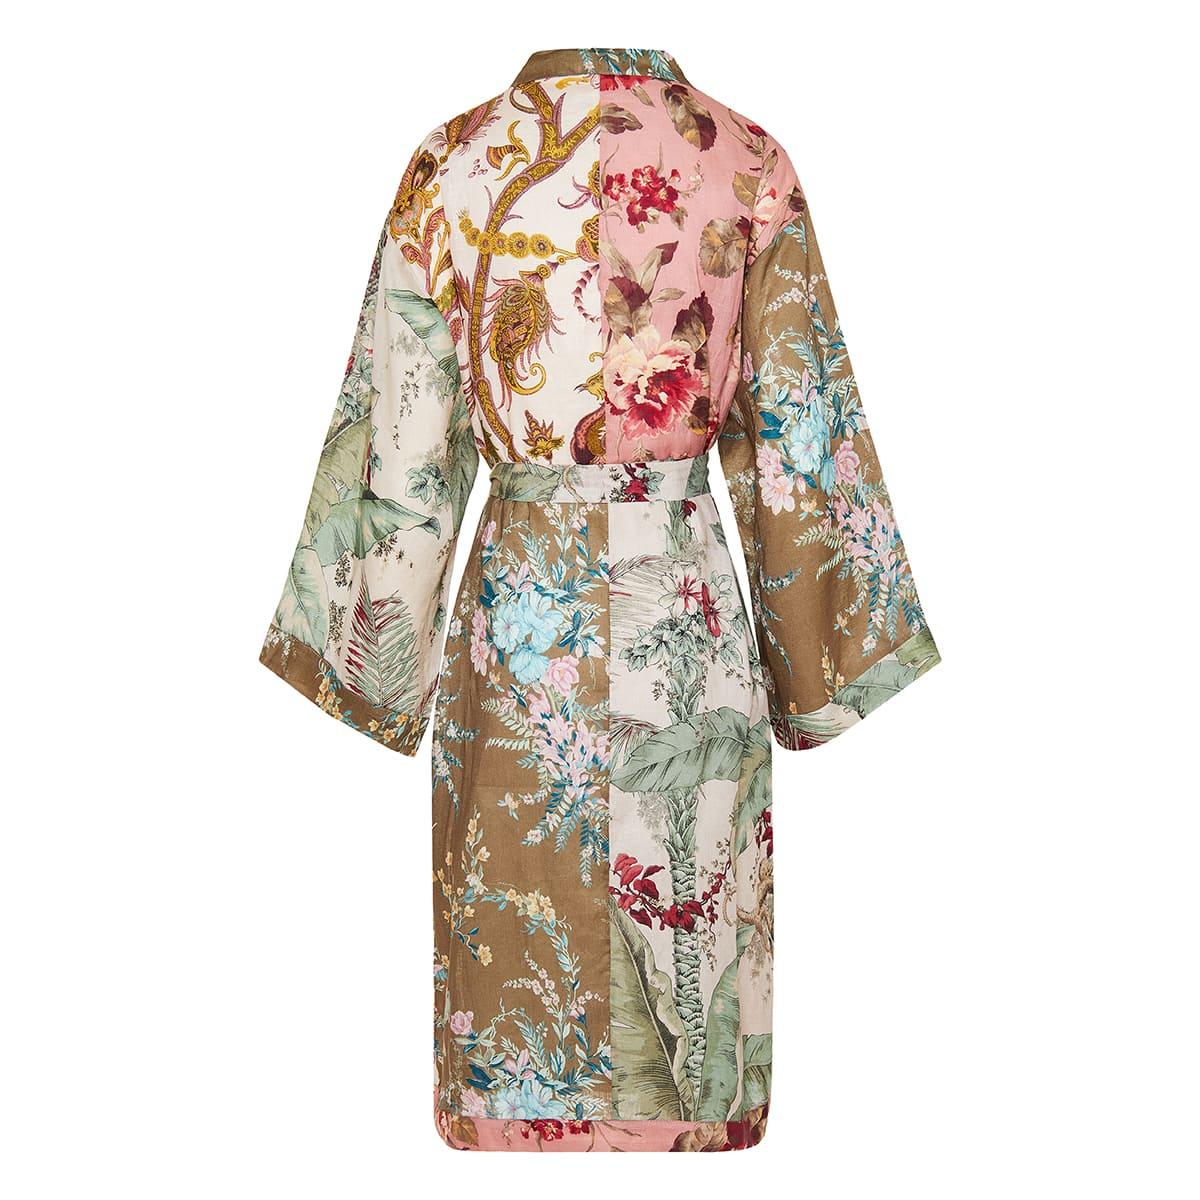 Cassia printed linen robe dress